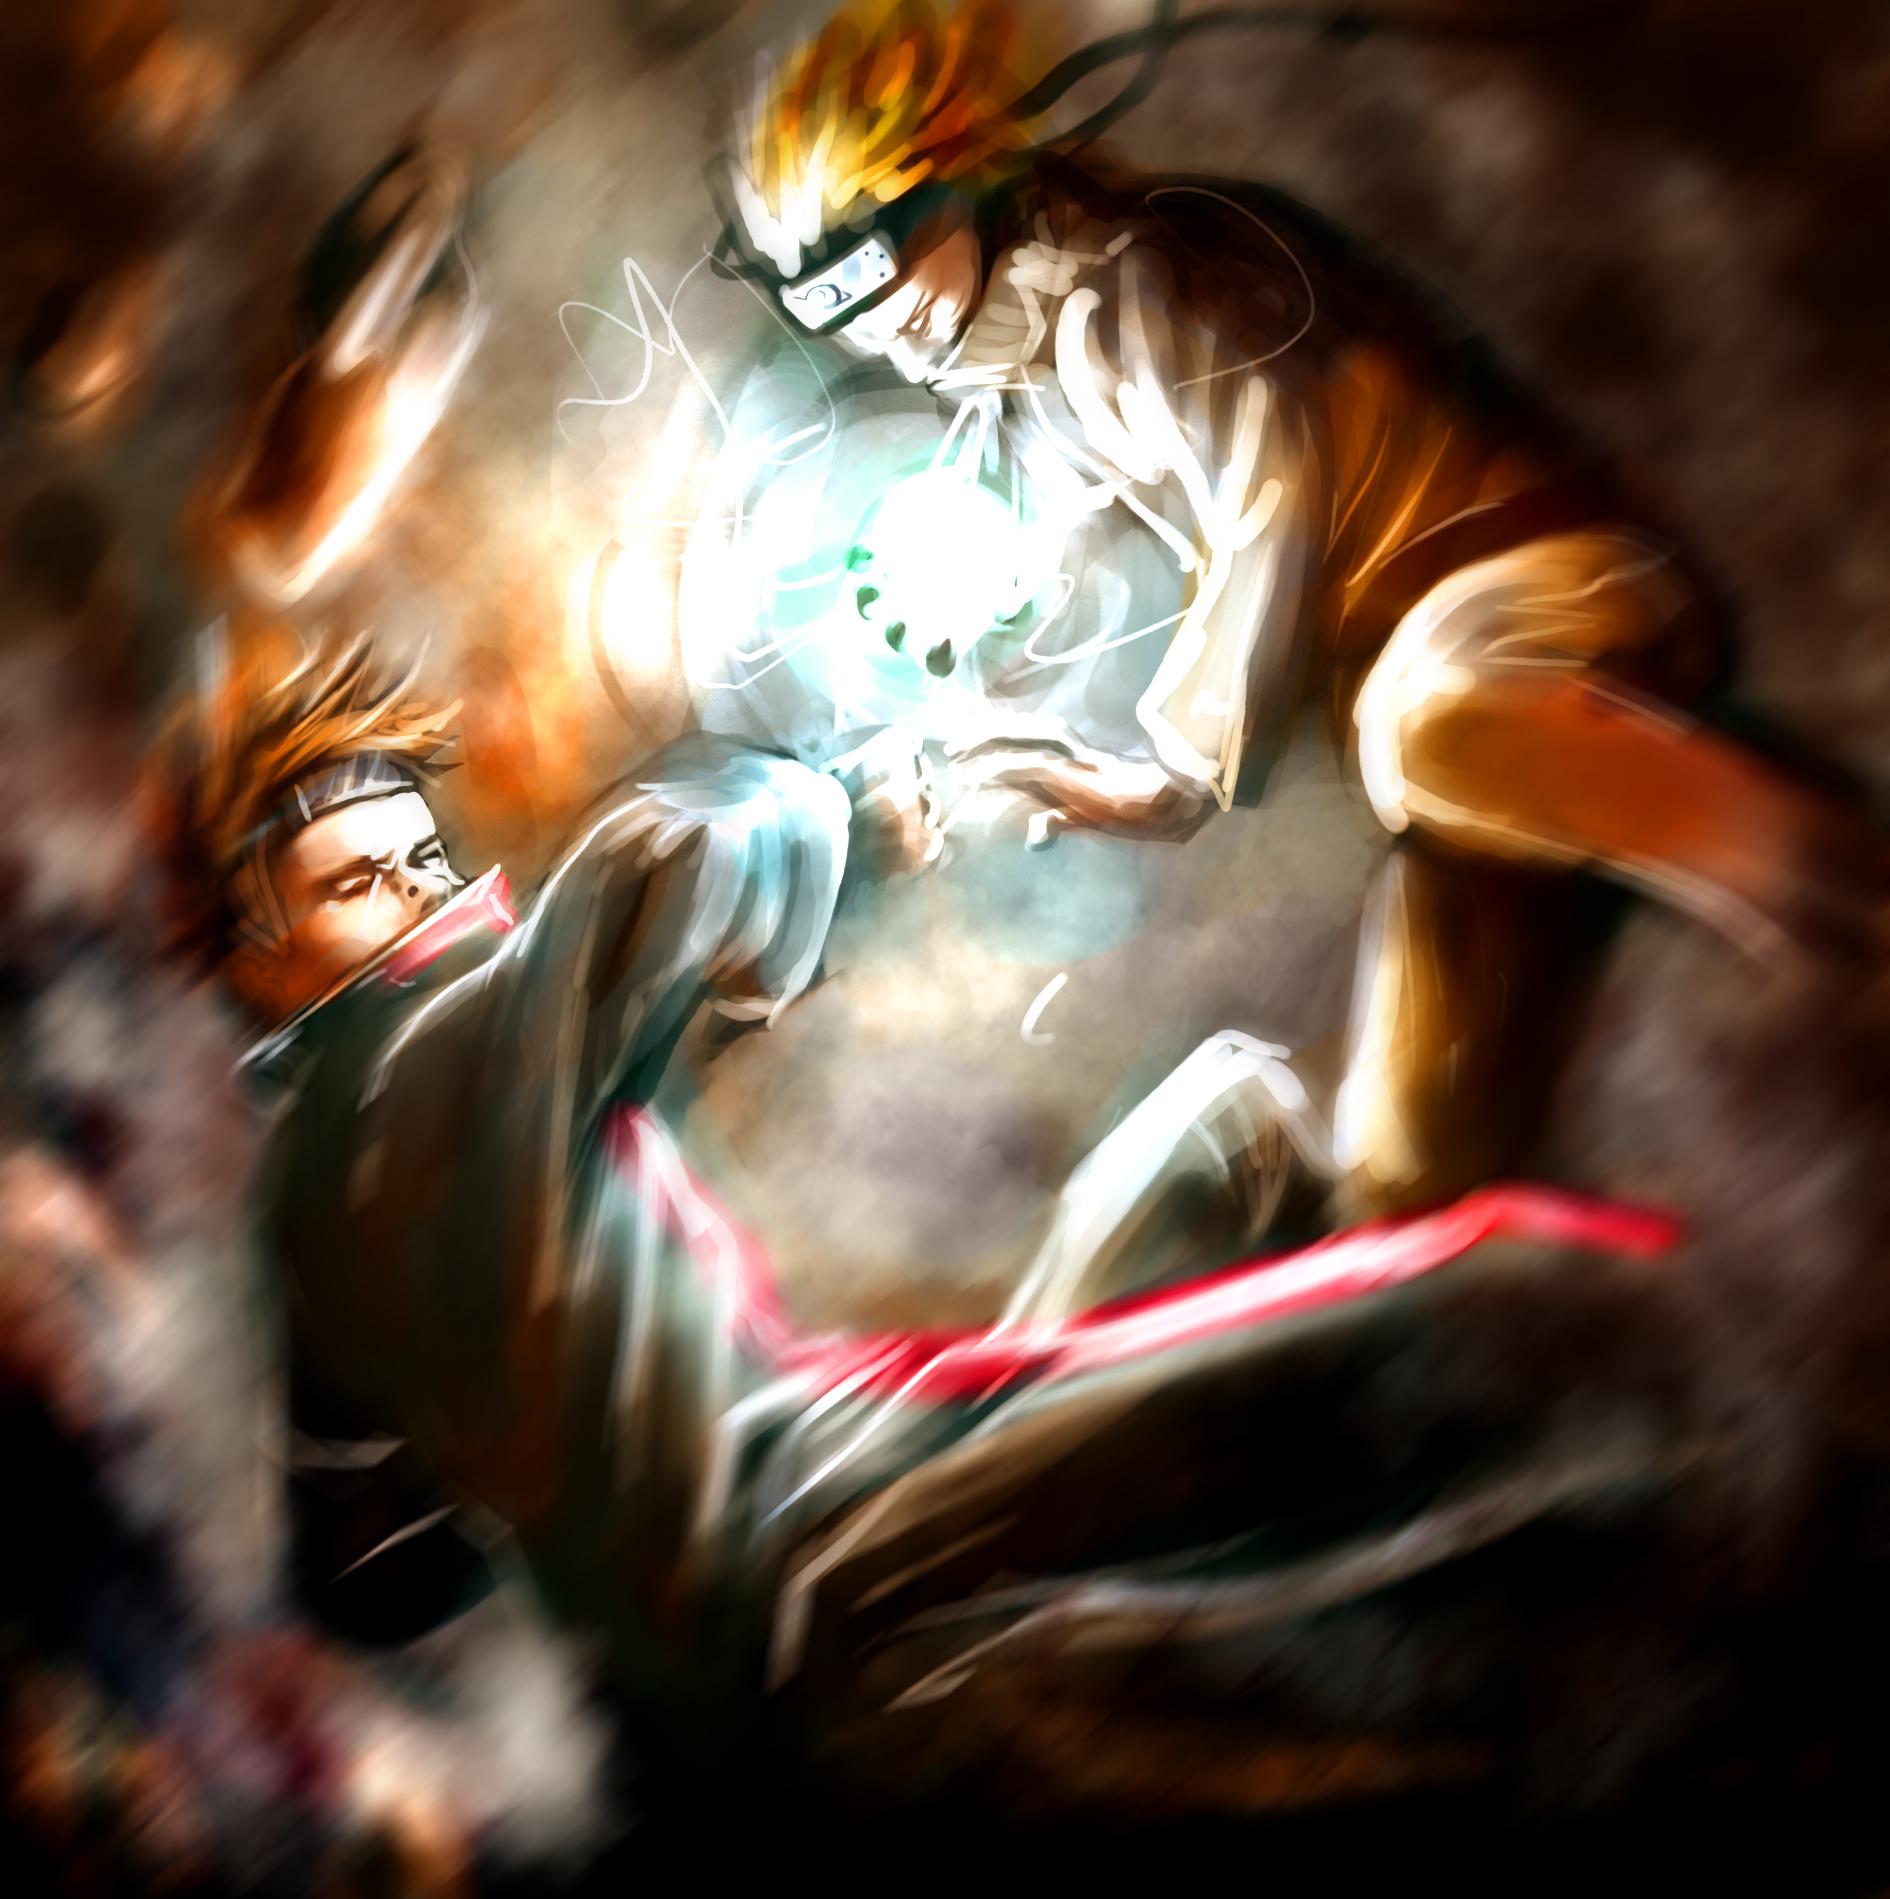 Naruto Hd Wallpaper: Naruto Vs Pain Wallpaper